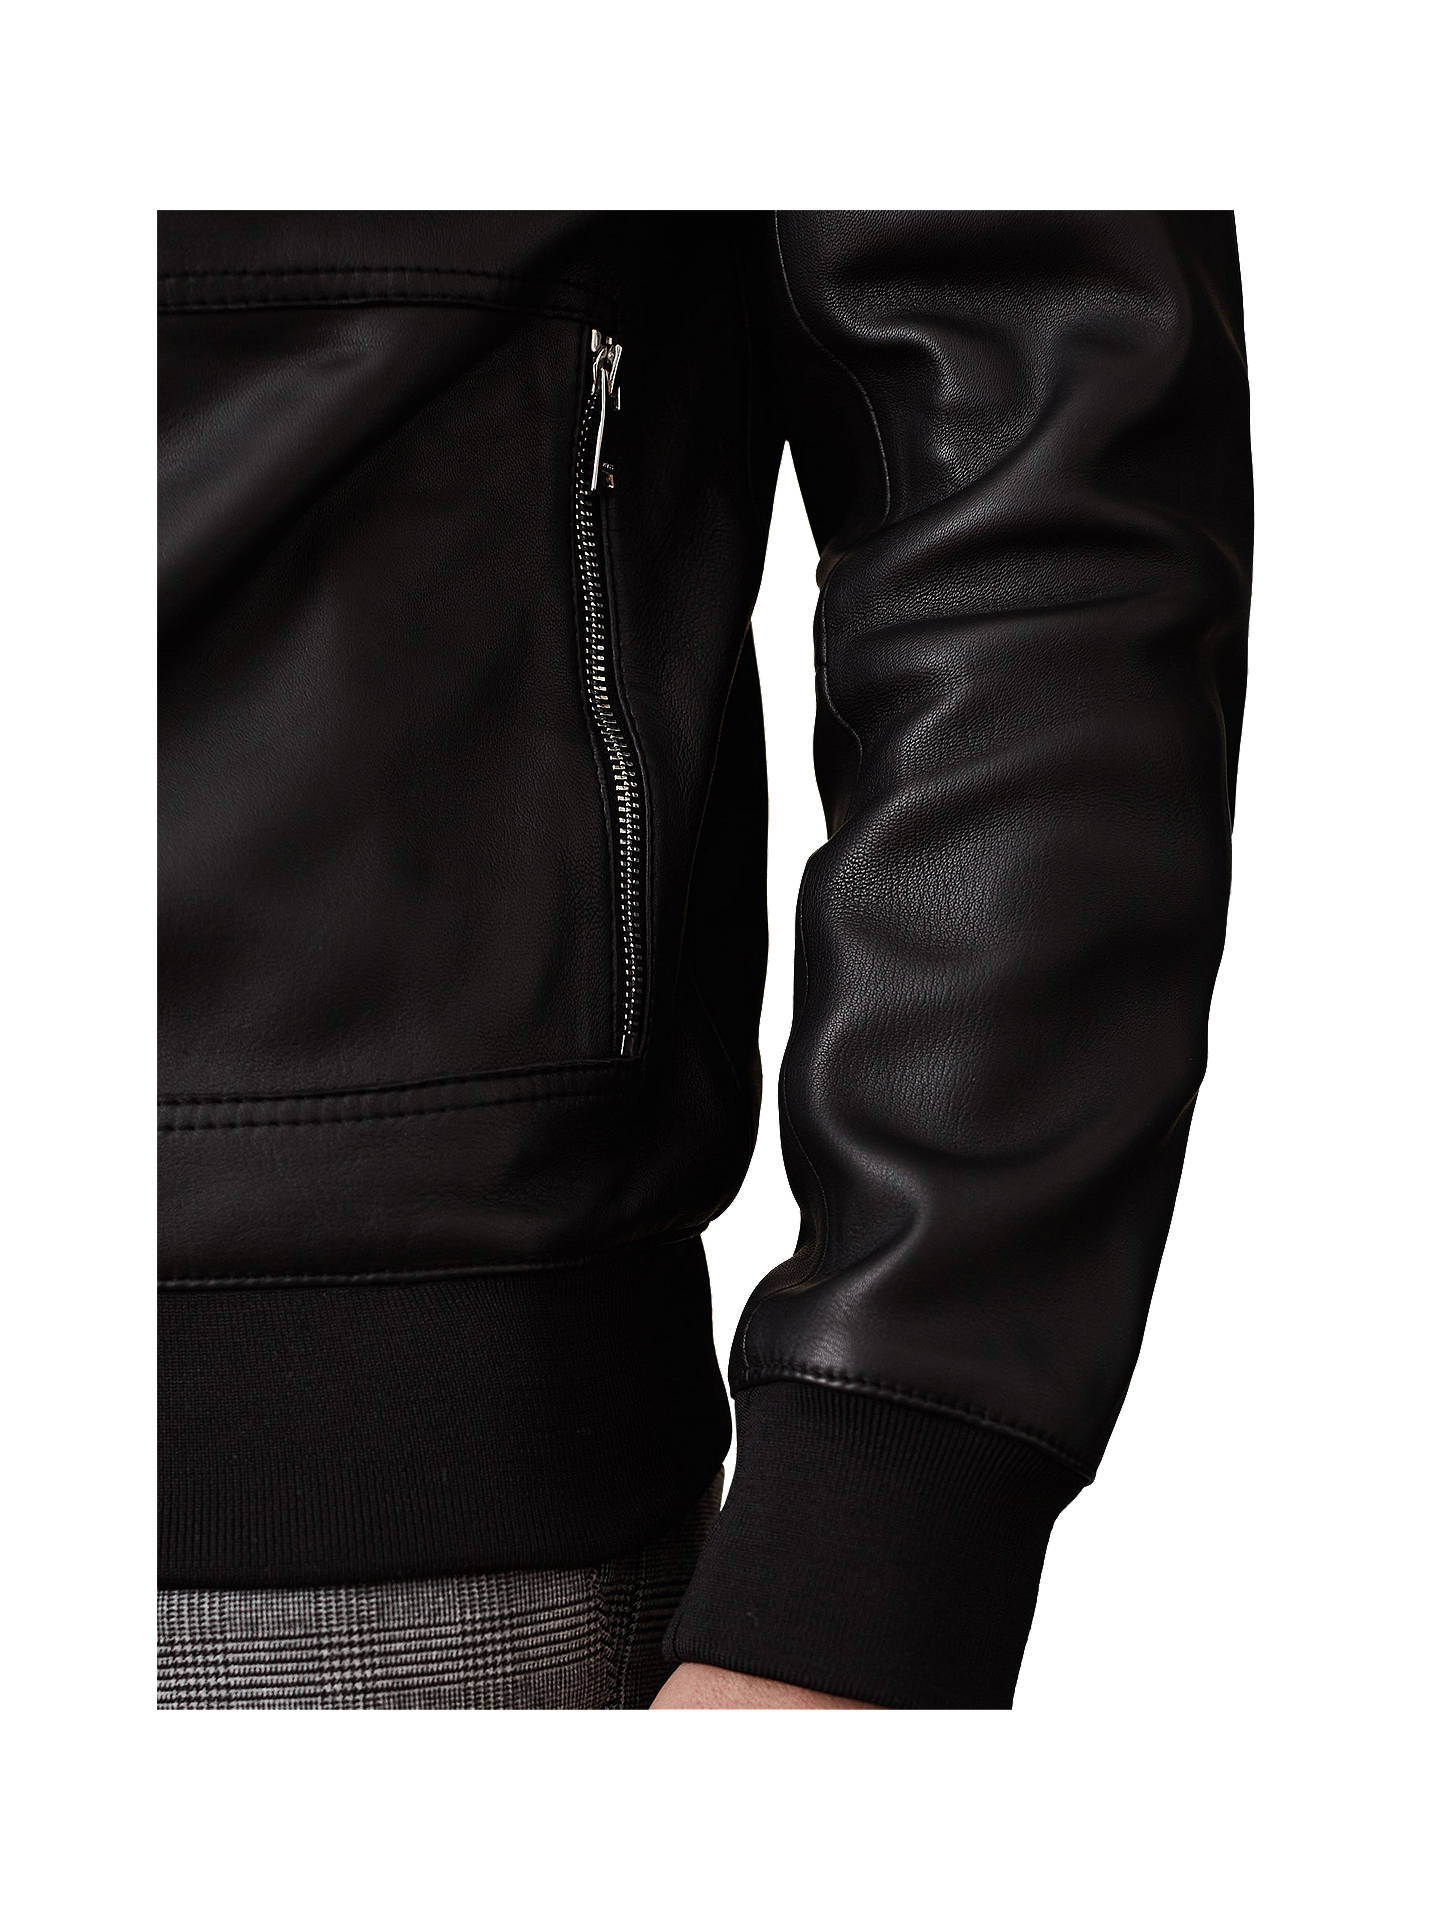 afdab823f Reiss Bones Leather Bomber Jacket, Black at John Lewis & Partners